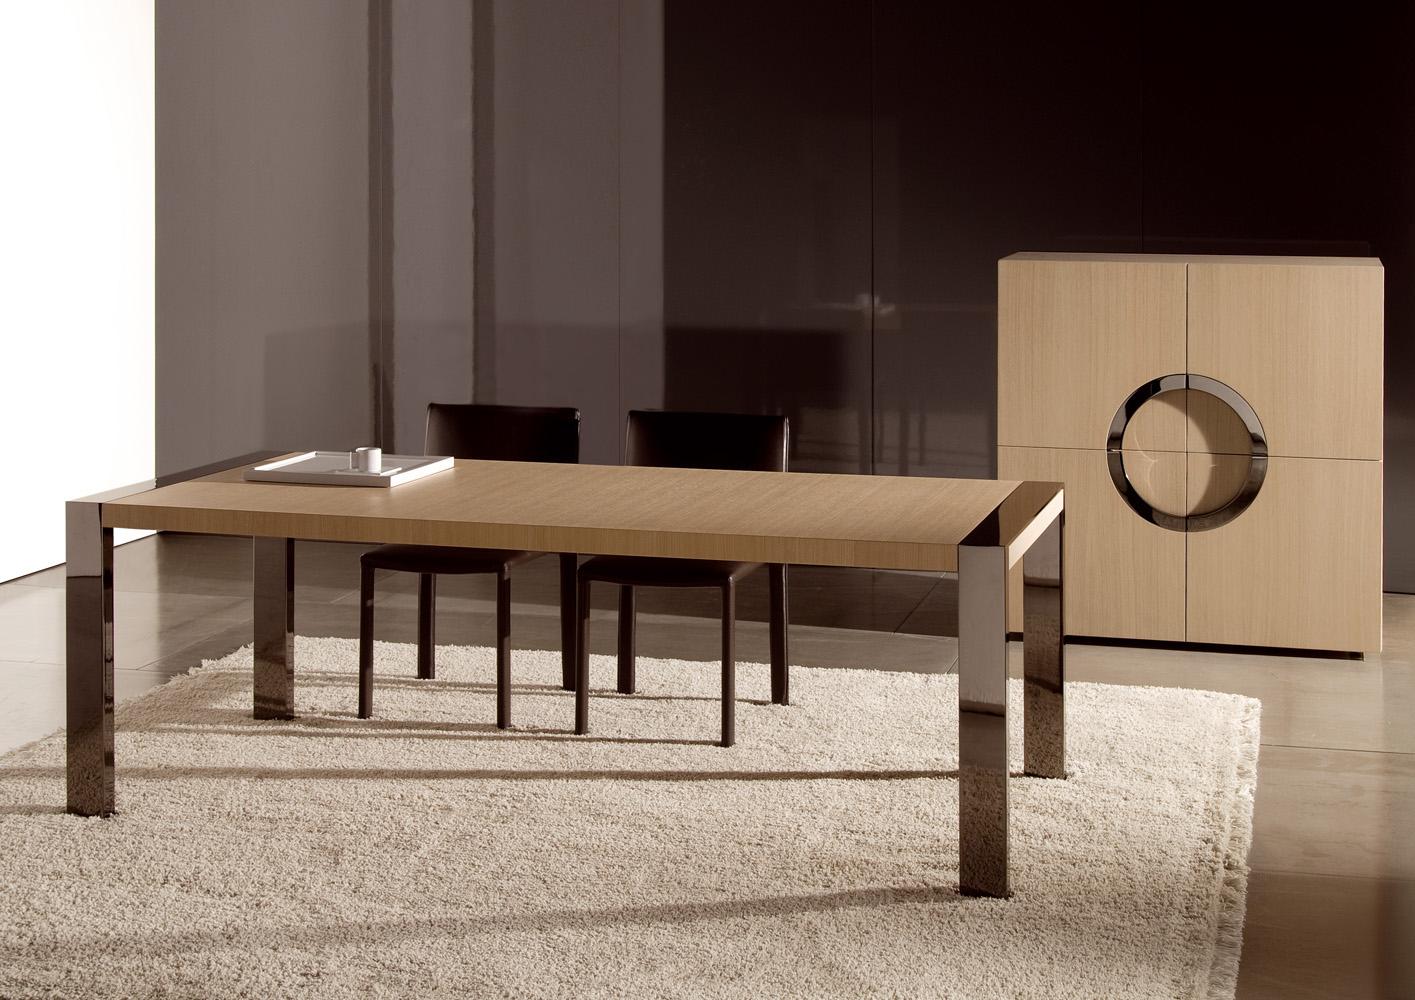 Lennon Table Designed By Rodolfo Dordoni Minotti